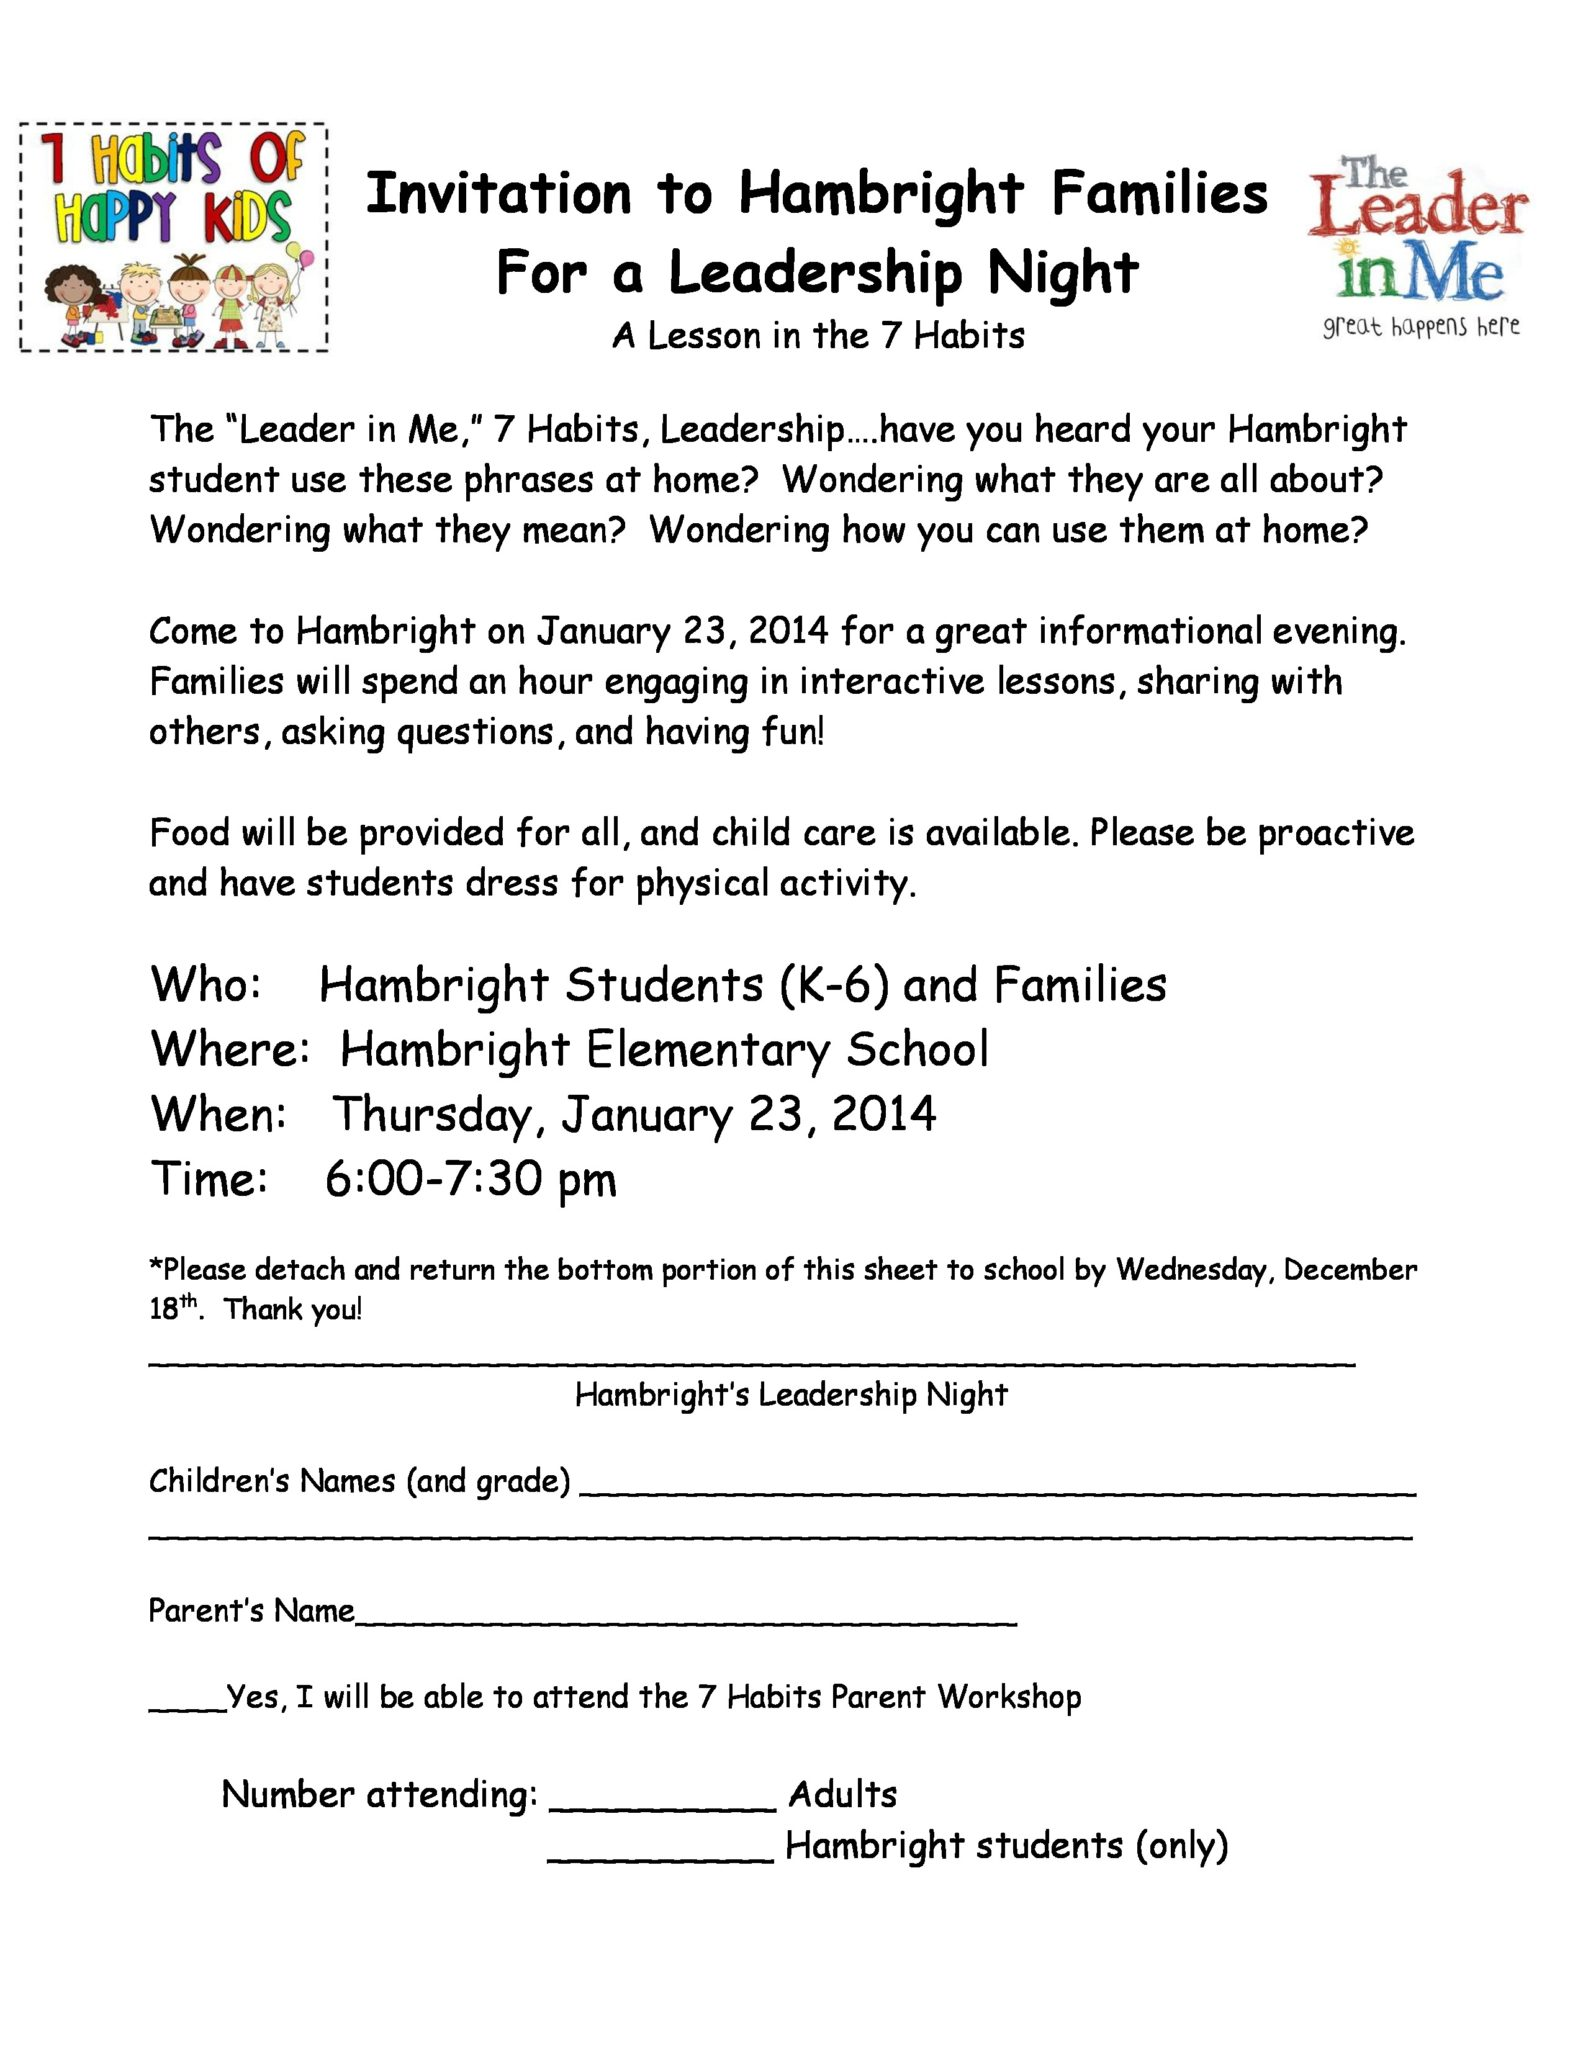 Hambright Leadership Night